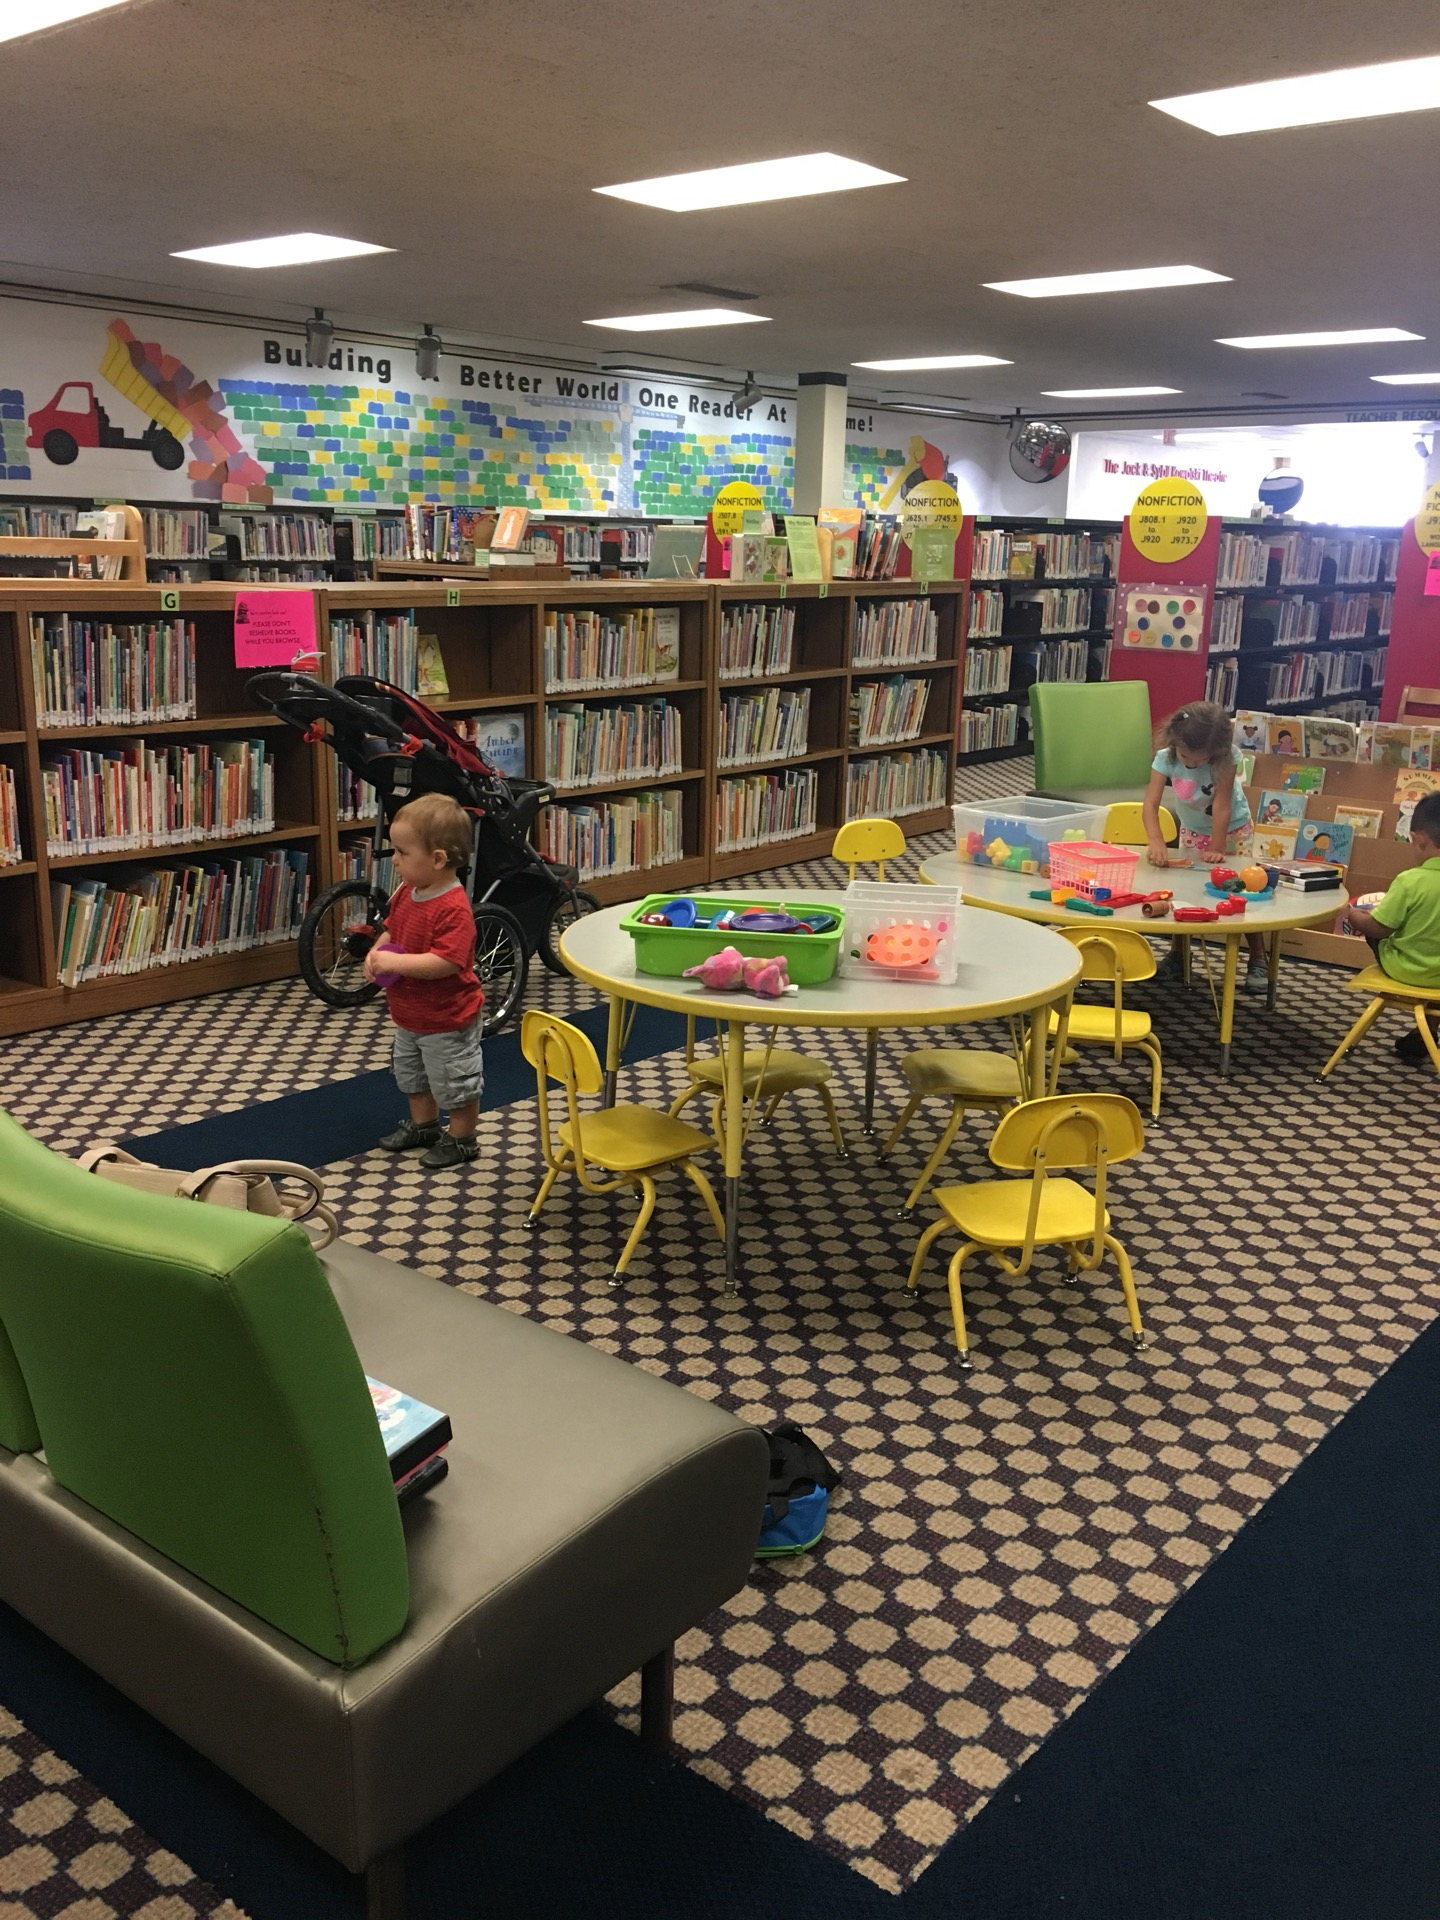 Wichita City Library   223 S Main St, Wichita, KS, 67202   +1 (316) 262-6991